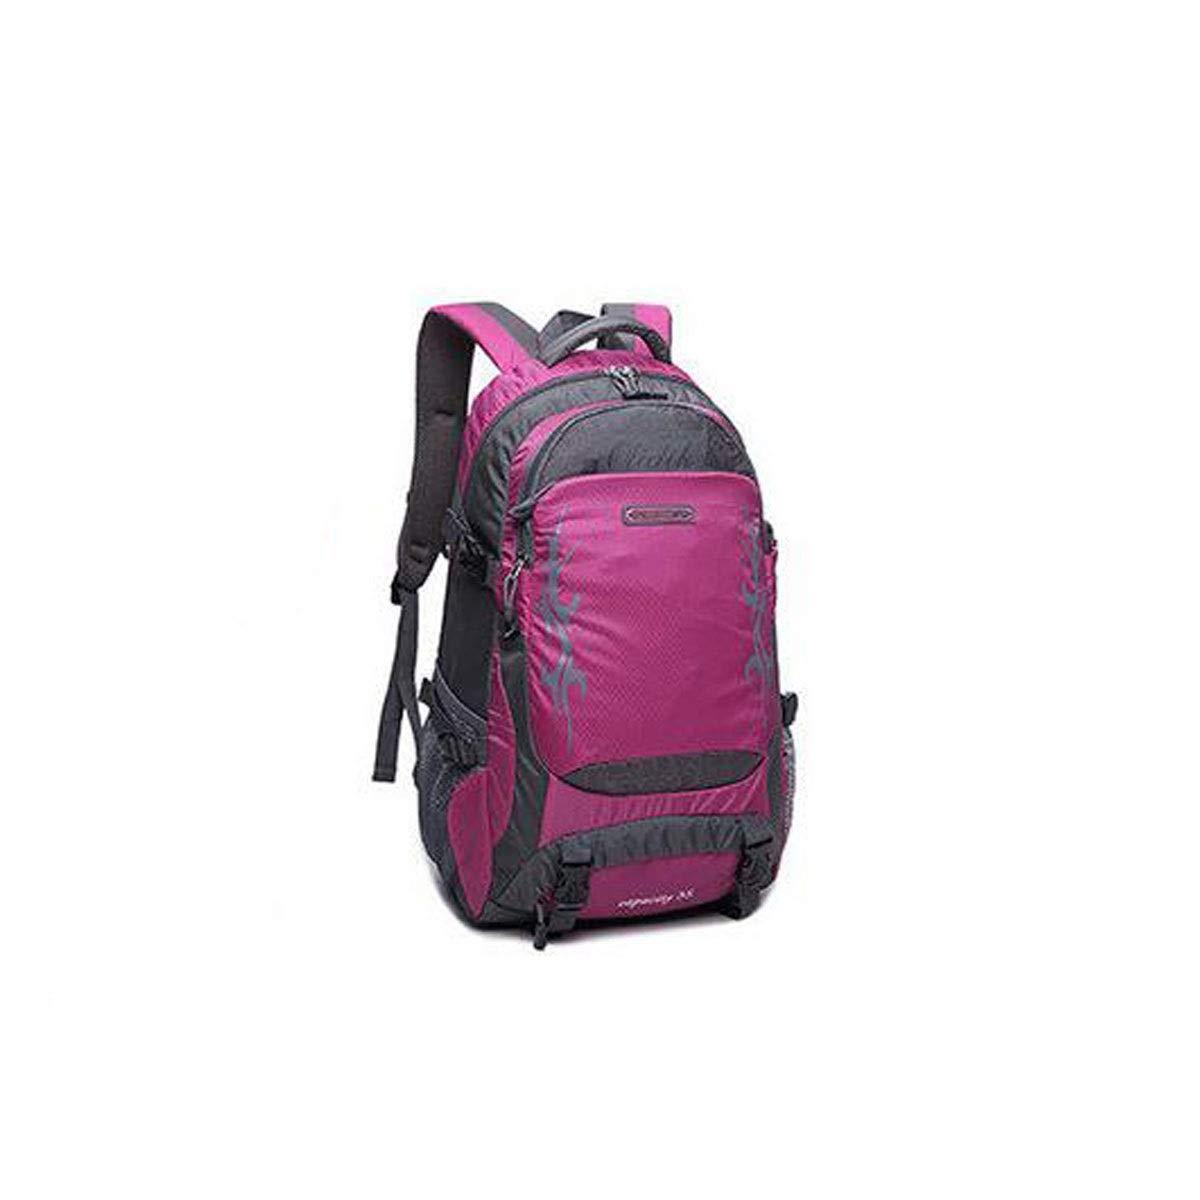 Chenjinxiang01 Large-Capacity Backpack Color : Purple Leisure Travel Light Waterproof Outdoor Mountaineering Bag 40L Black, Blue, Orange, Purple, Military Green, Rose red